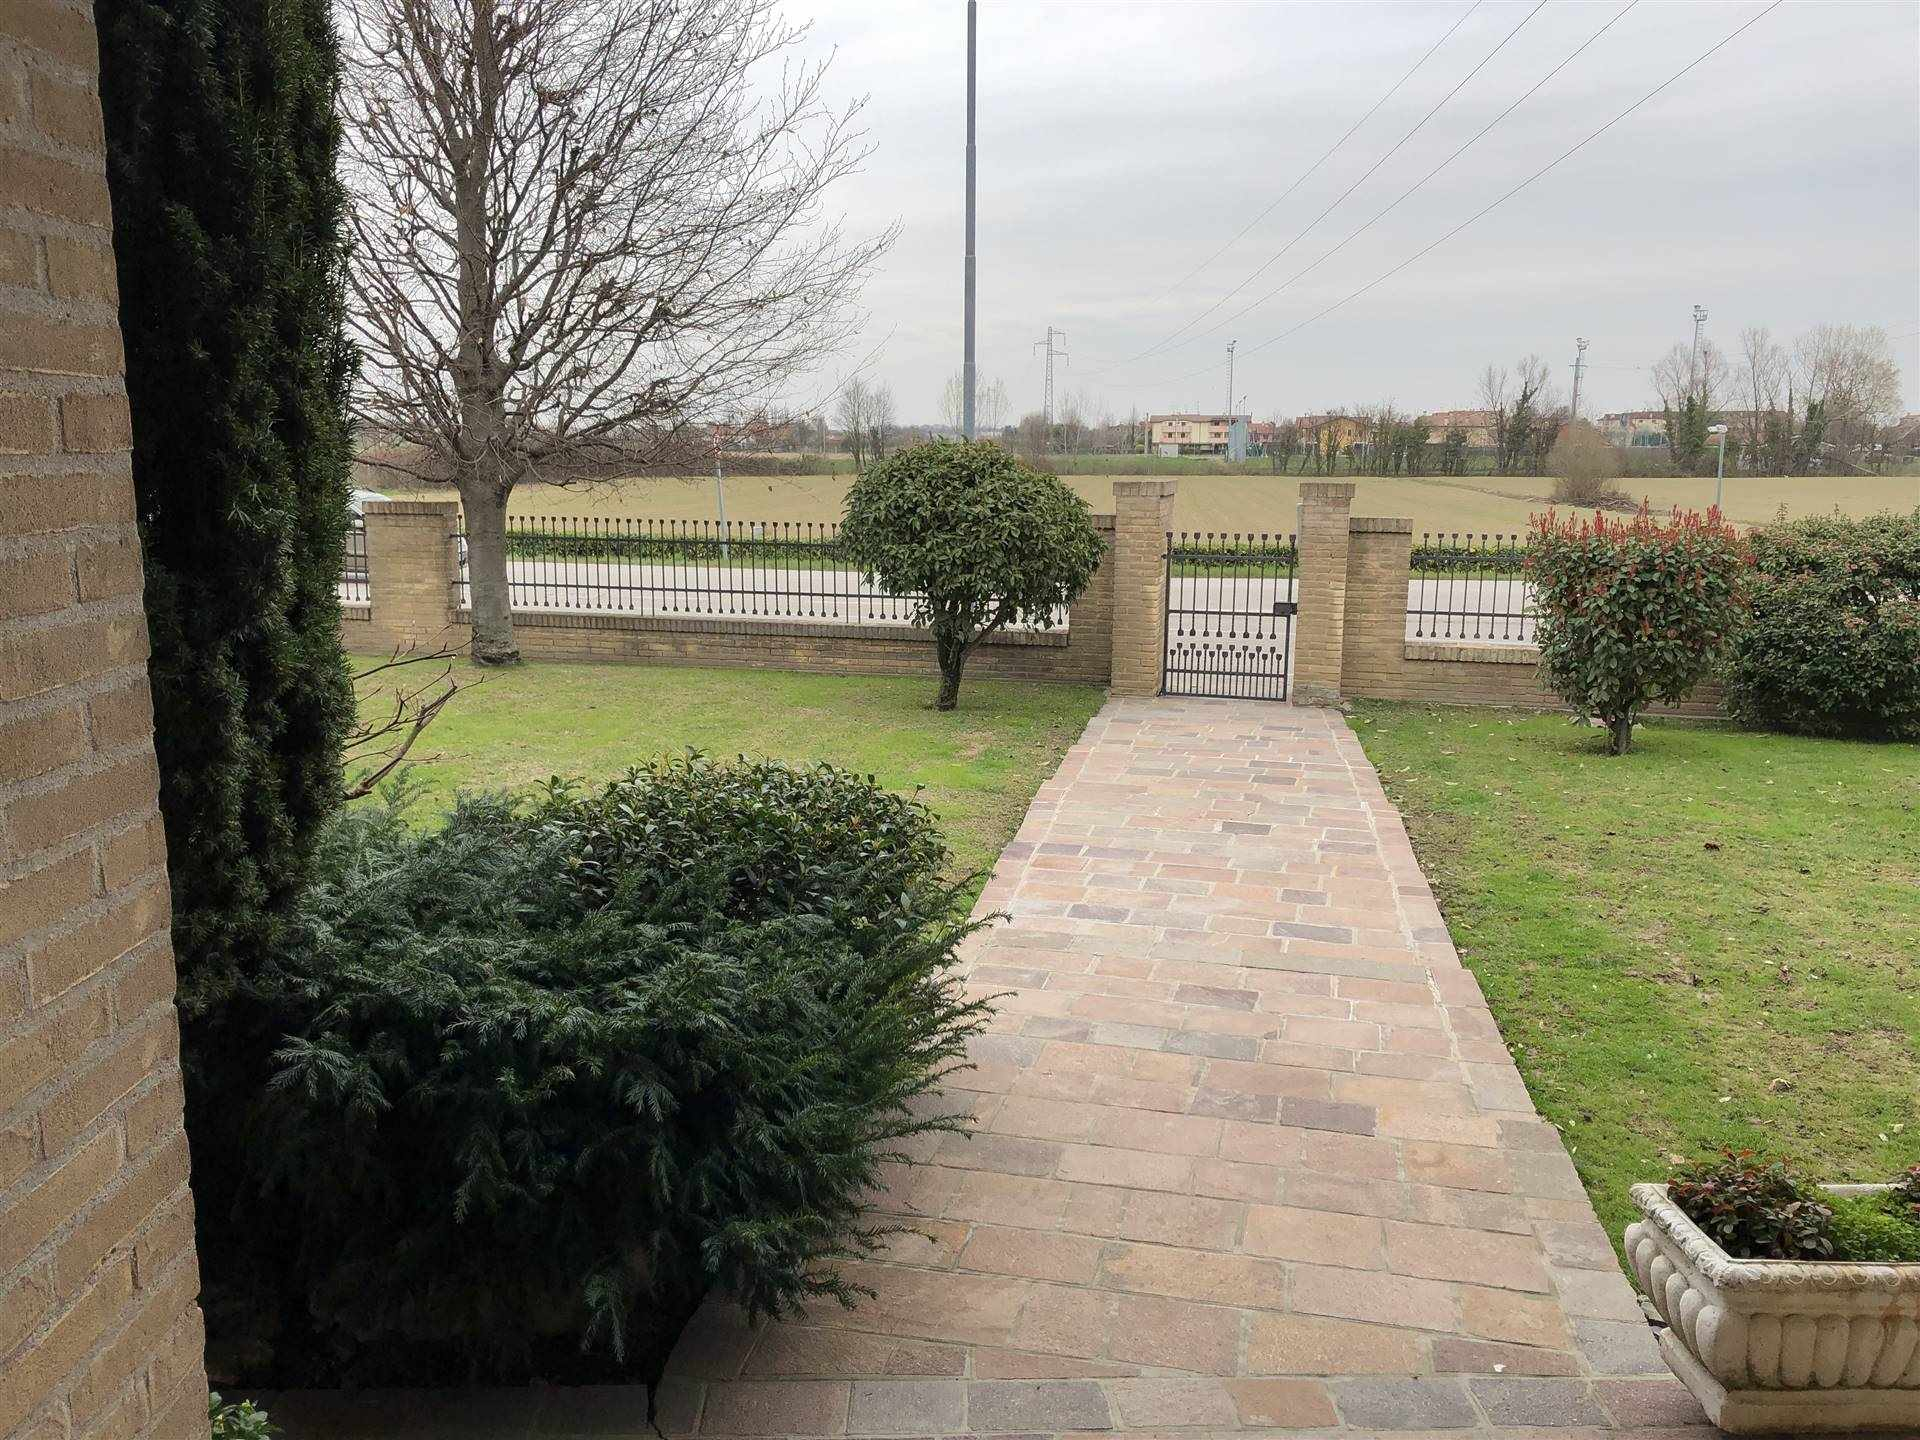 Villa con giardino a Albignasego - 01, Foto